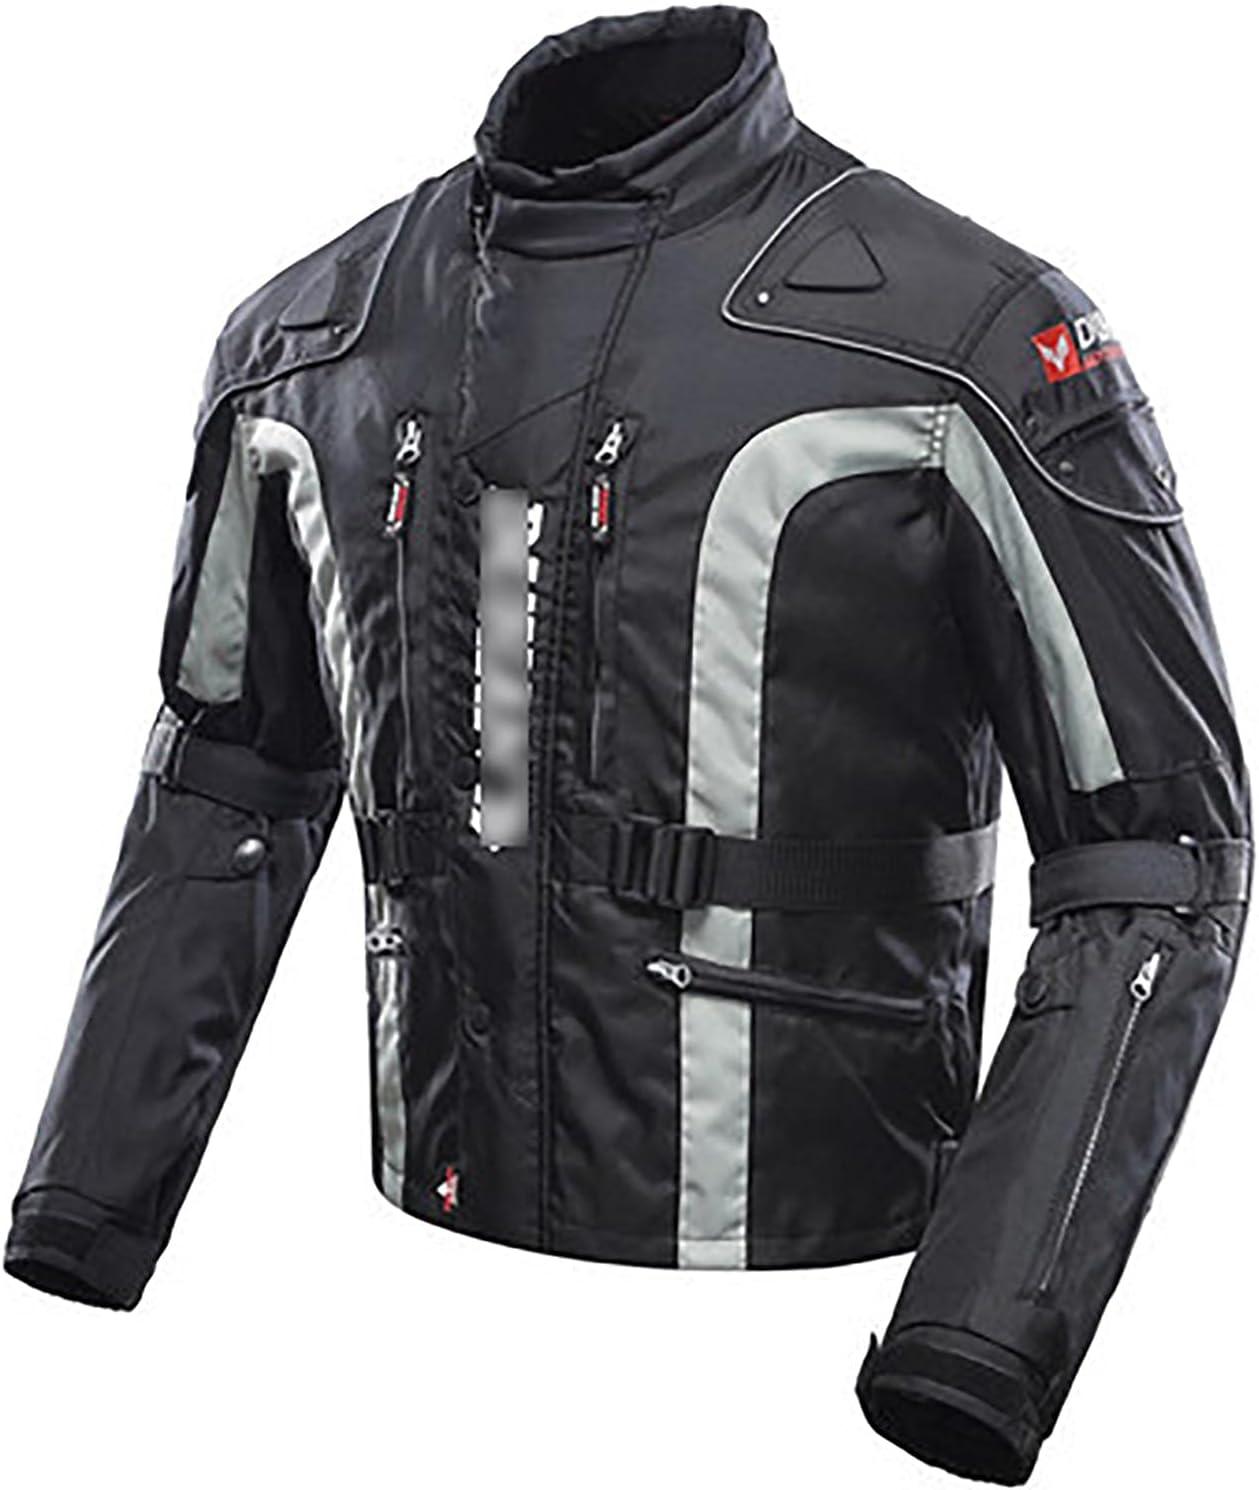 Motorcycle Jacket Manufacturer OFFicial shop Motorbike Elegant Riding Protective CE Arm Gear